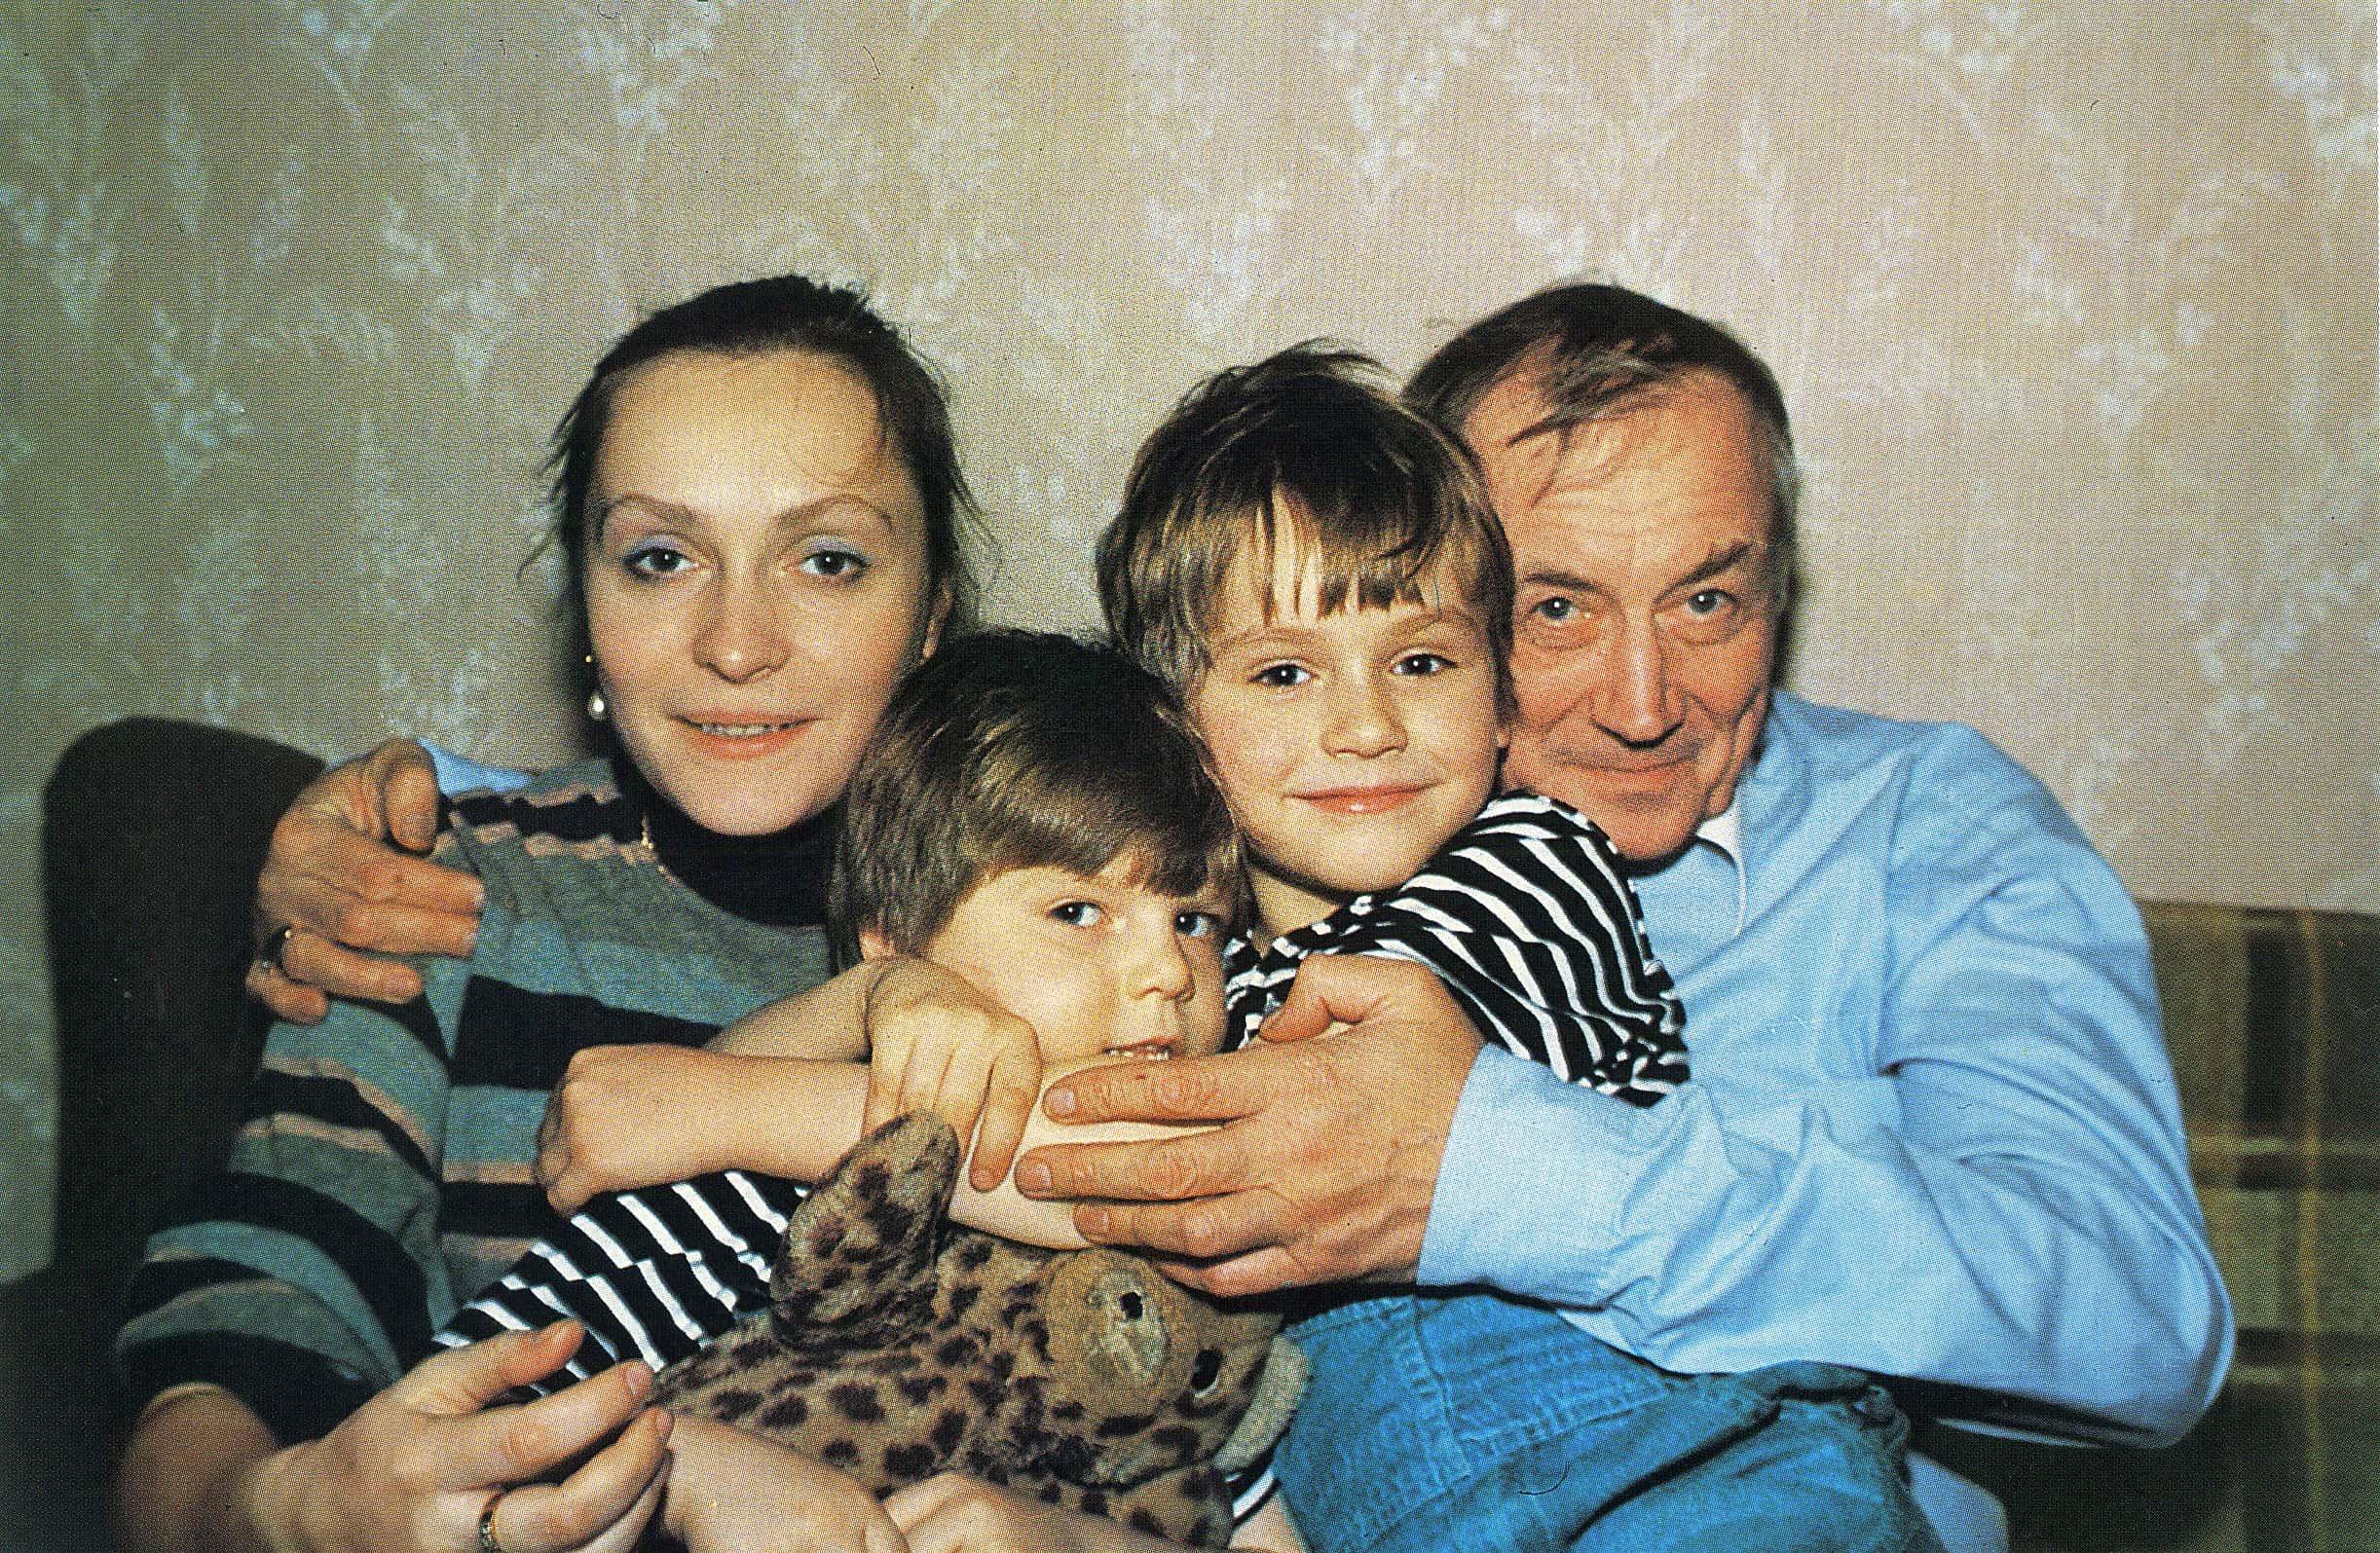 Евгений Евтушенко с женой и детьми. Фото Семена Майстермана